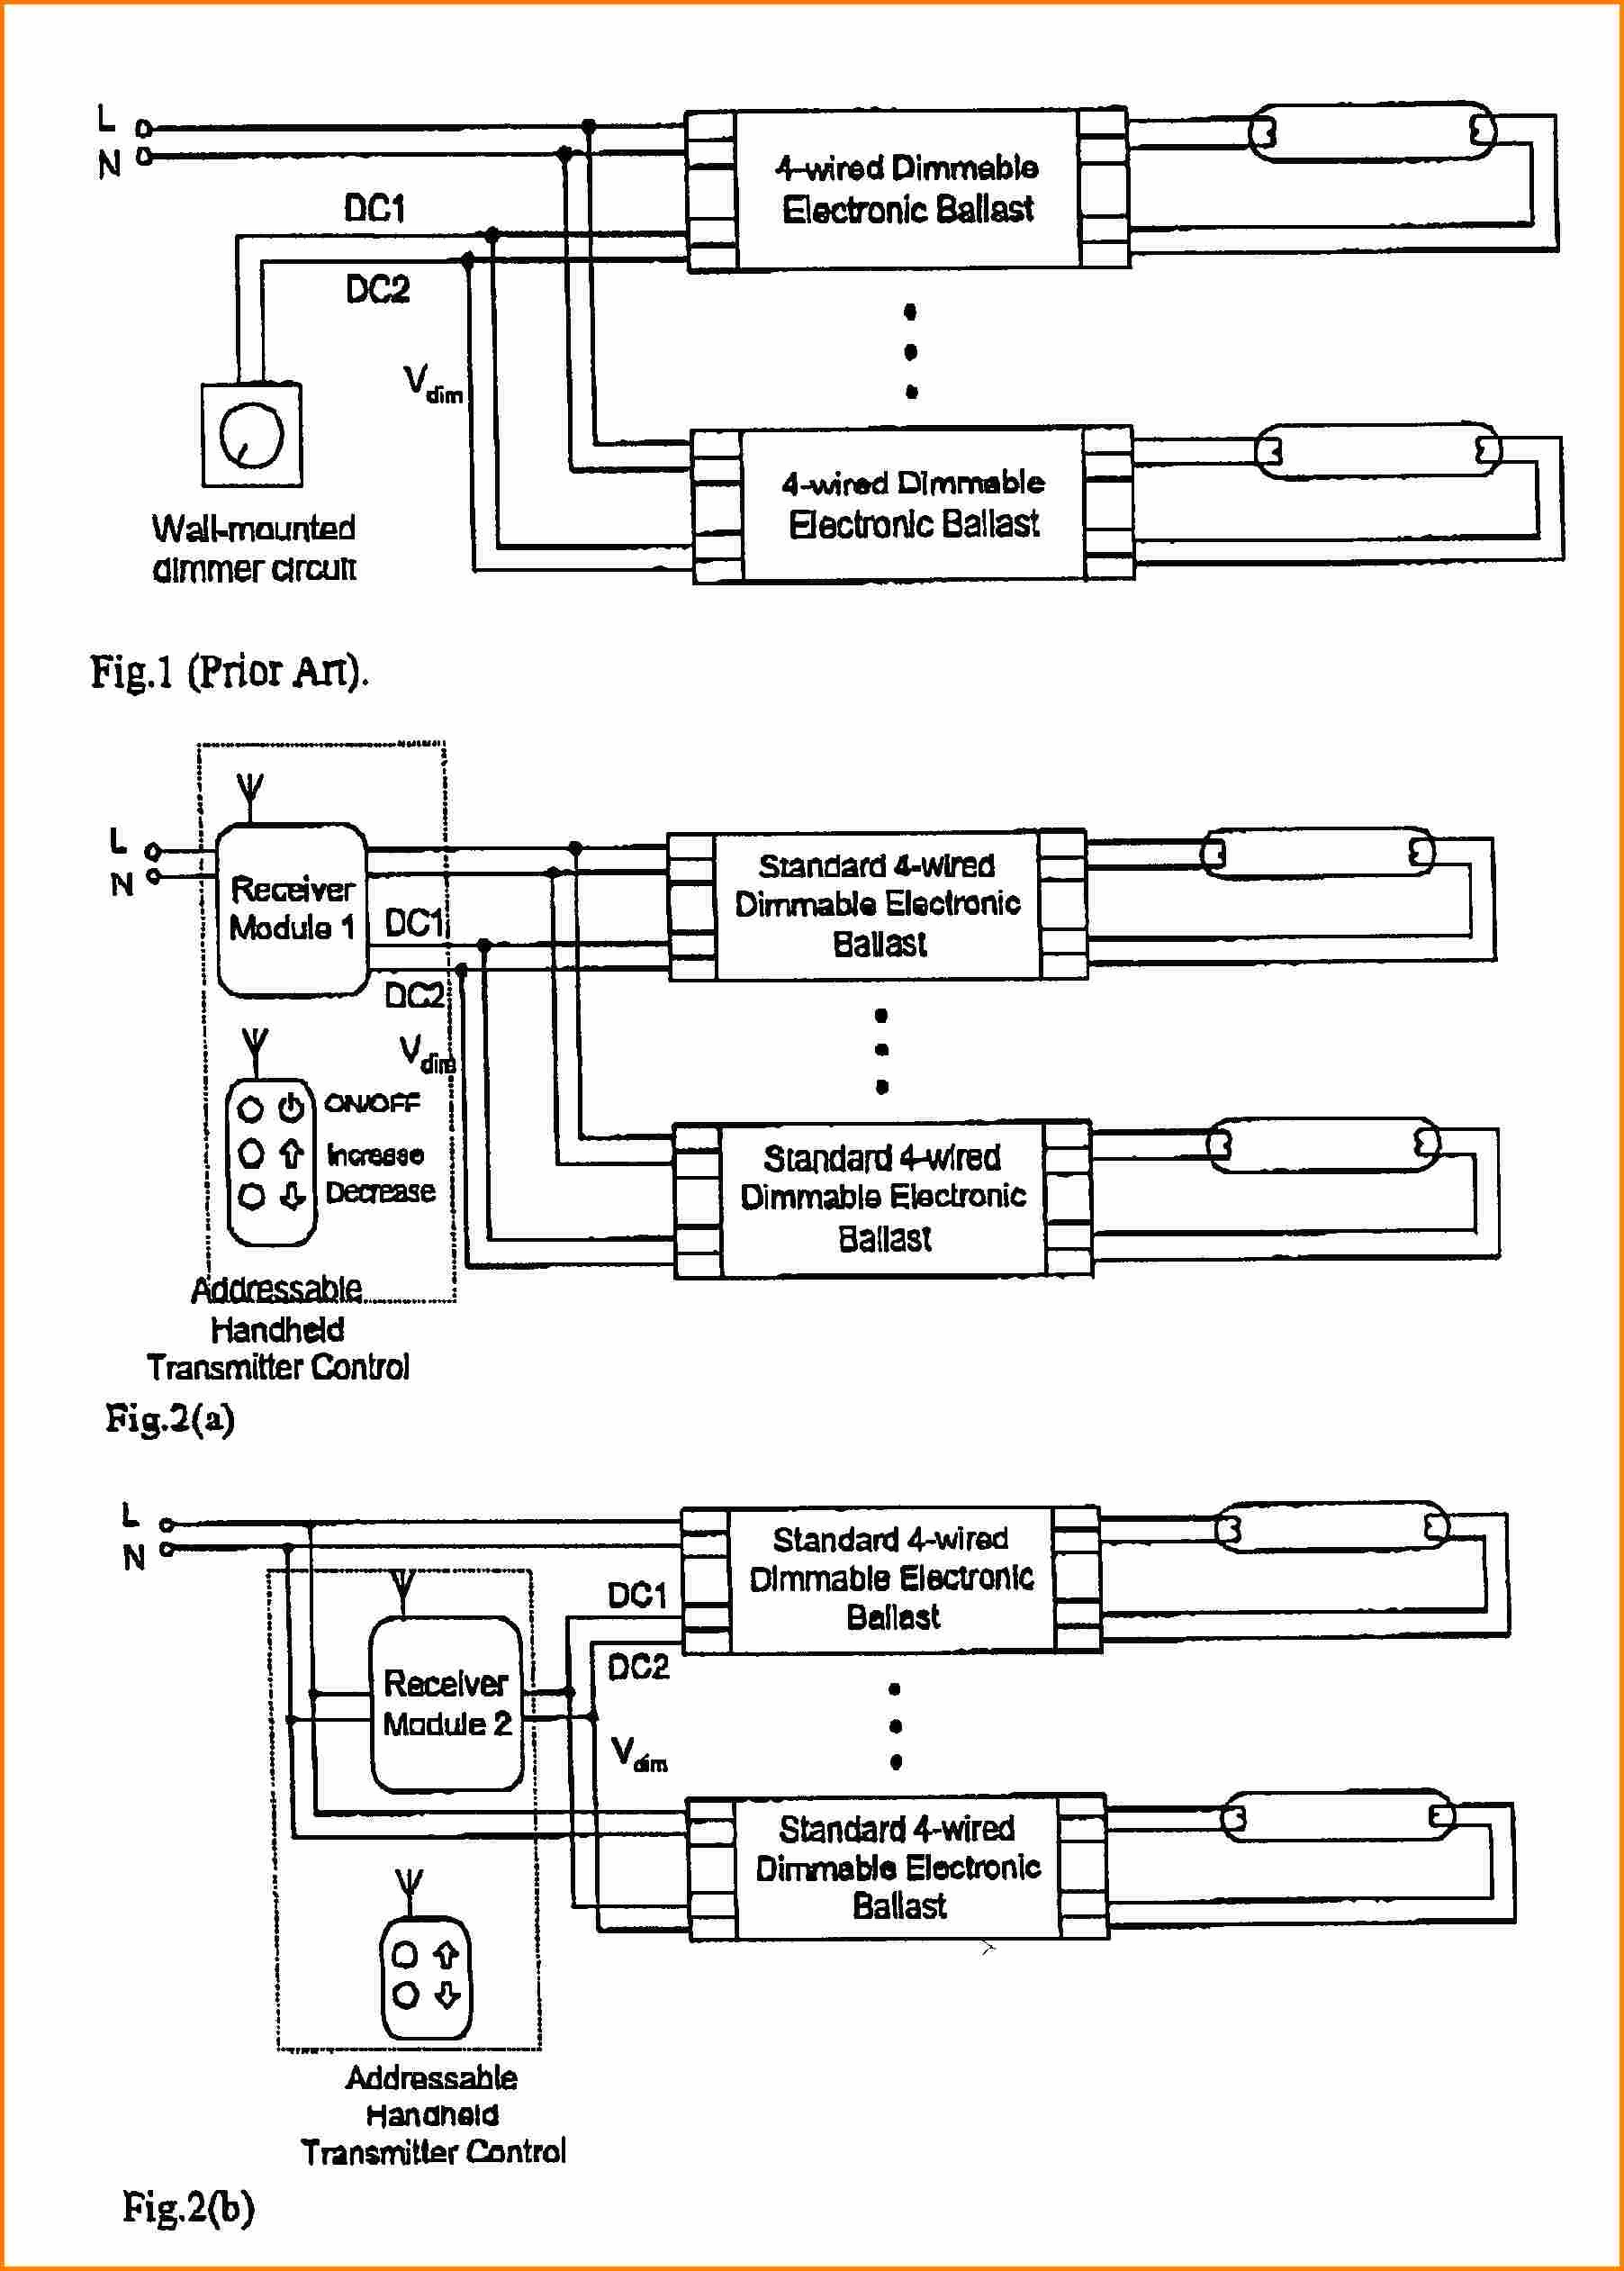 0 10 Volt Dimming Wiring Diagram   Wiring Diagram - 0 10 Volt Dimming Wiring Diagram